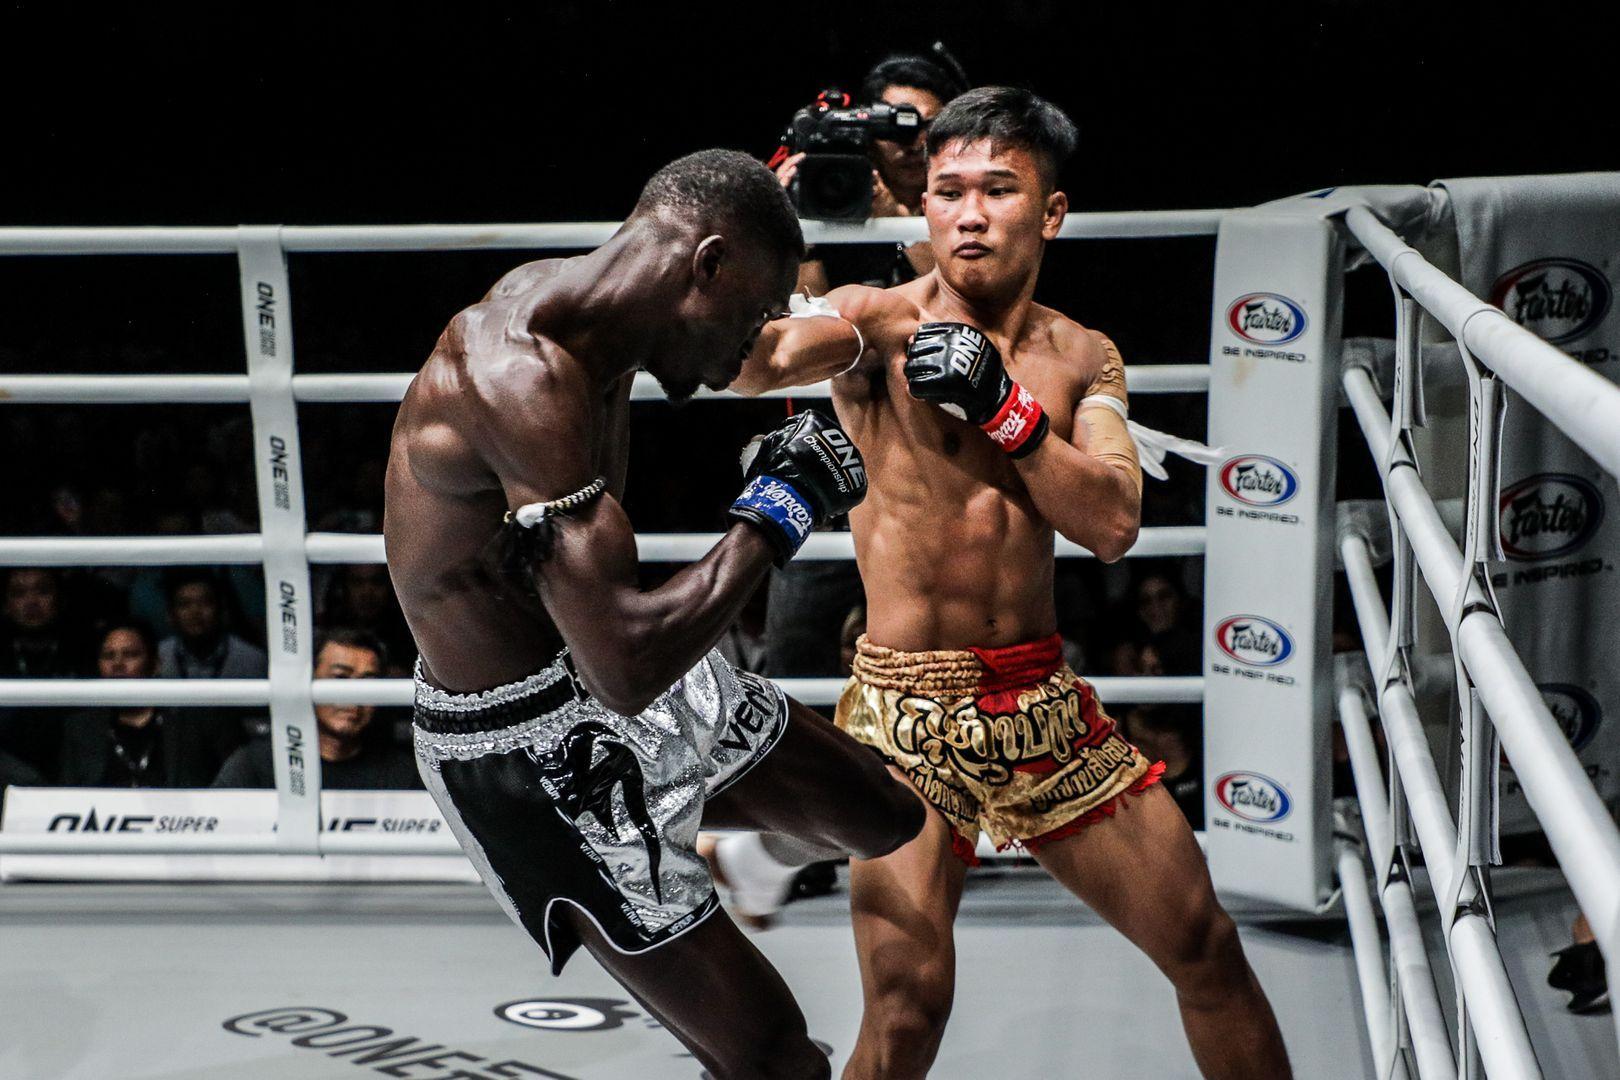 Tiebreaker Times Kulabdam targets KO in Clash with Sangmanee come ONE: No Surrender III Muay Thai News ONE Championship  Sangmanee Klong SuanPluResort ONE: No Surrender Kulabdam Sor. Jor. Piek Uthai